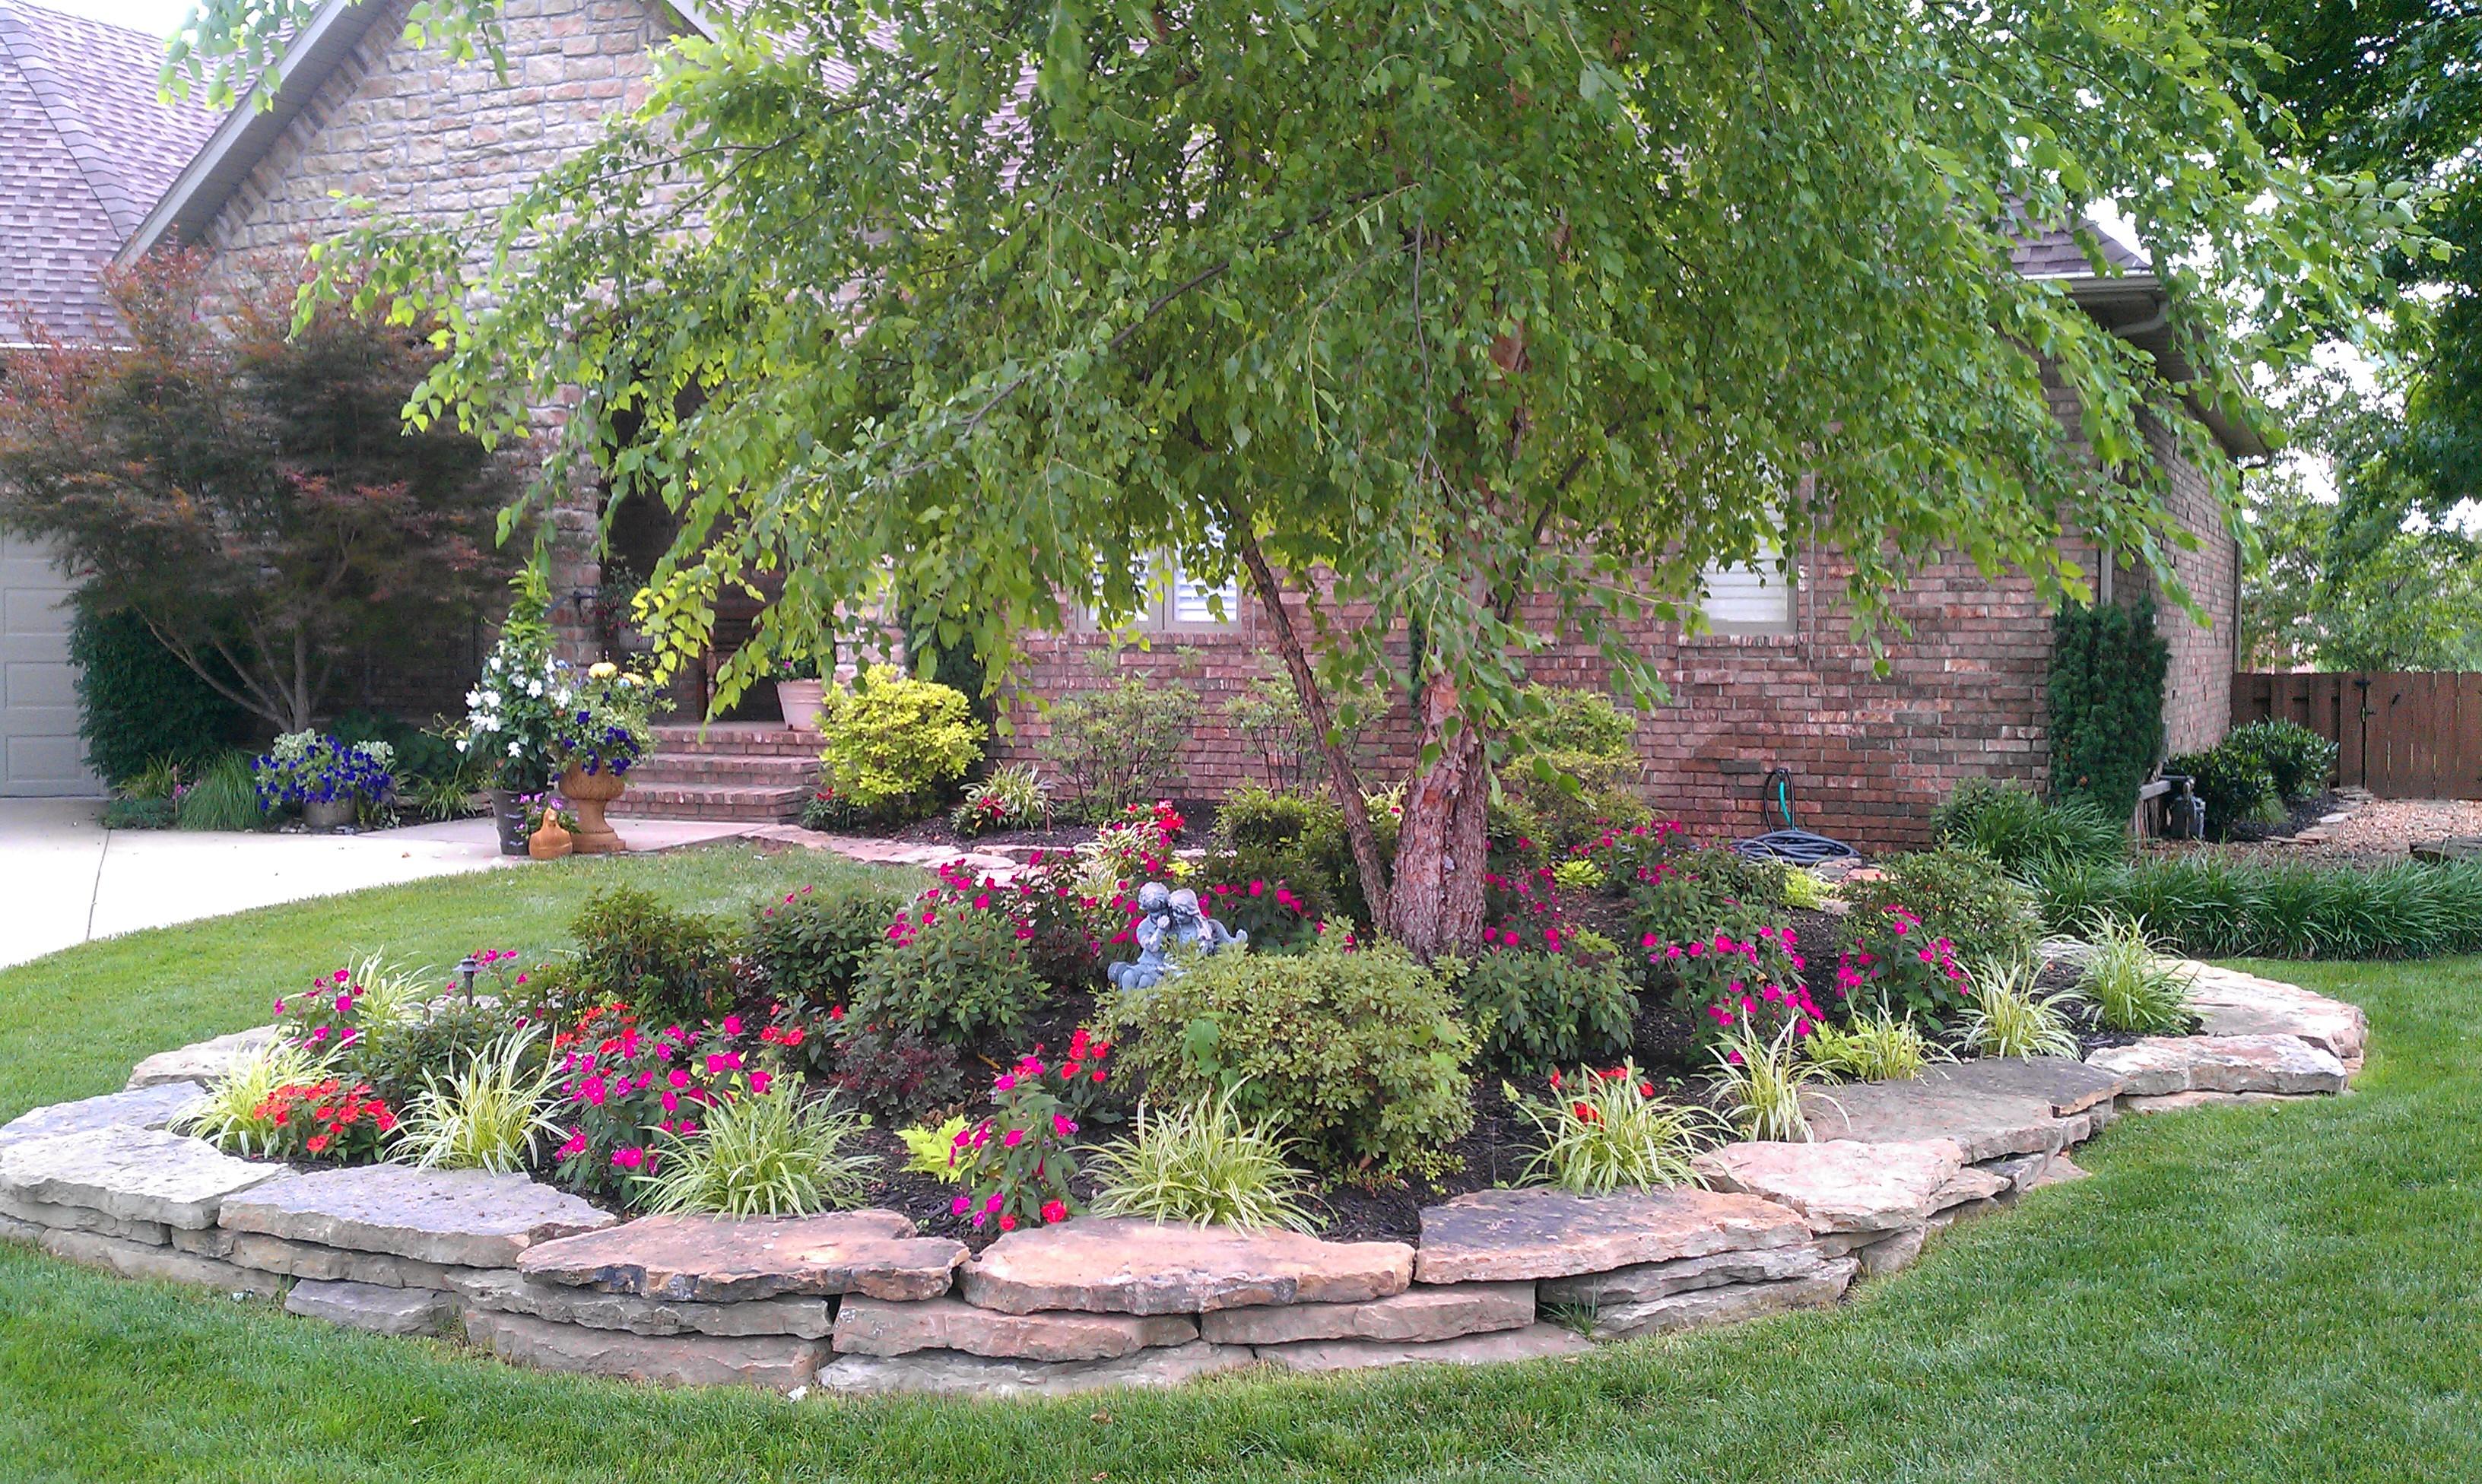 Best Residential Landscape Design-417 Home Magazine ... on Best Yard Design id=54369